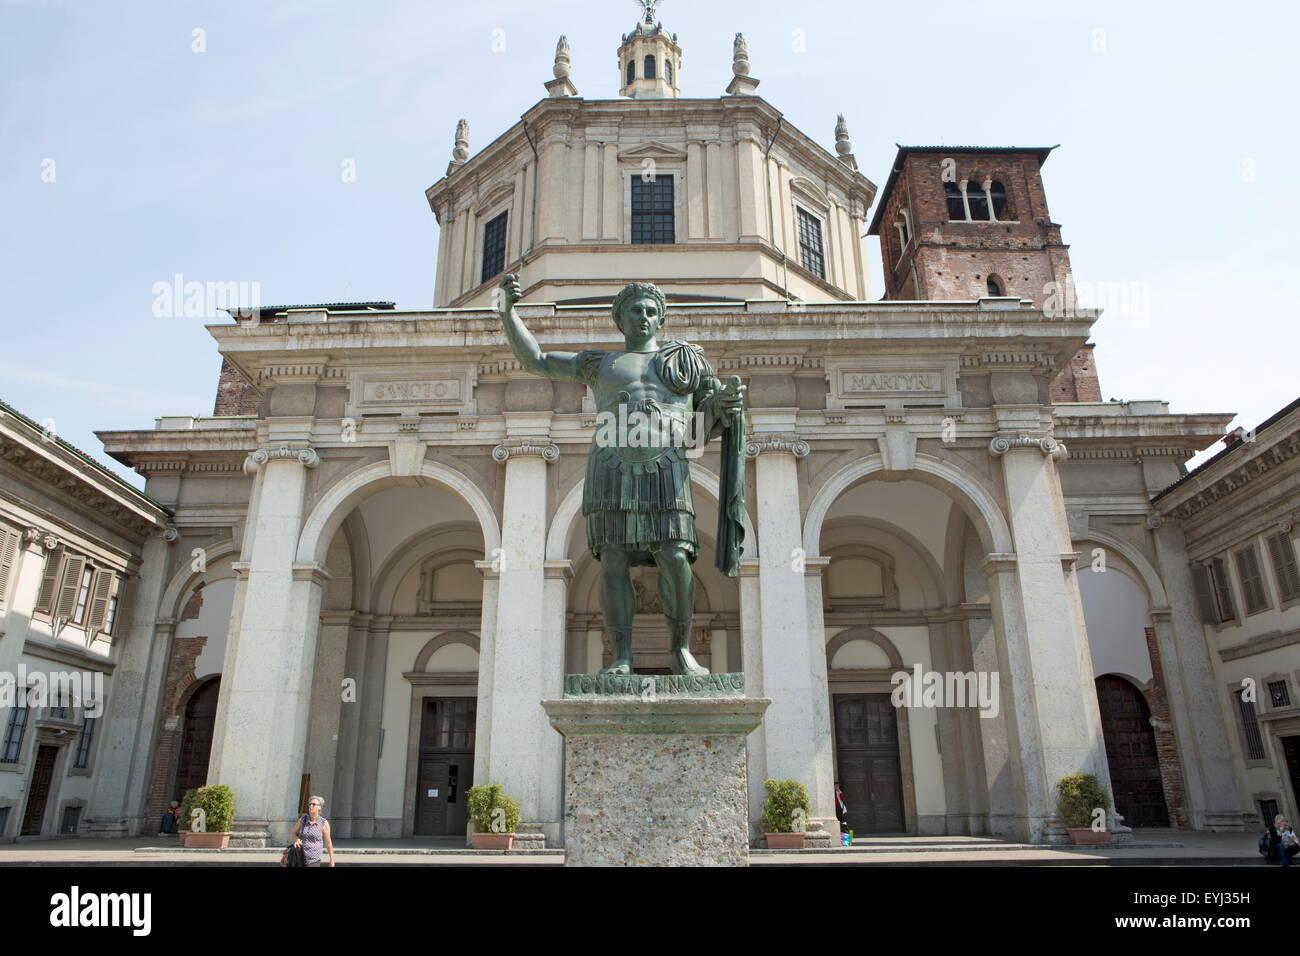 Basilica of San Lorenzo Maggiore, Milan, Milano, Lombardy region, Italy - Stock Image